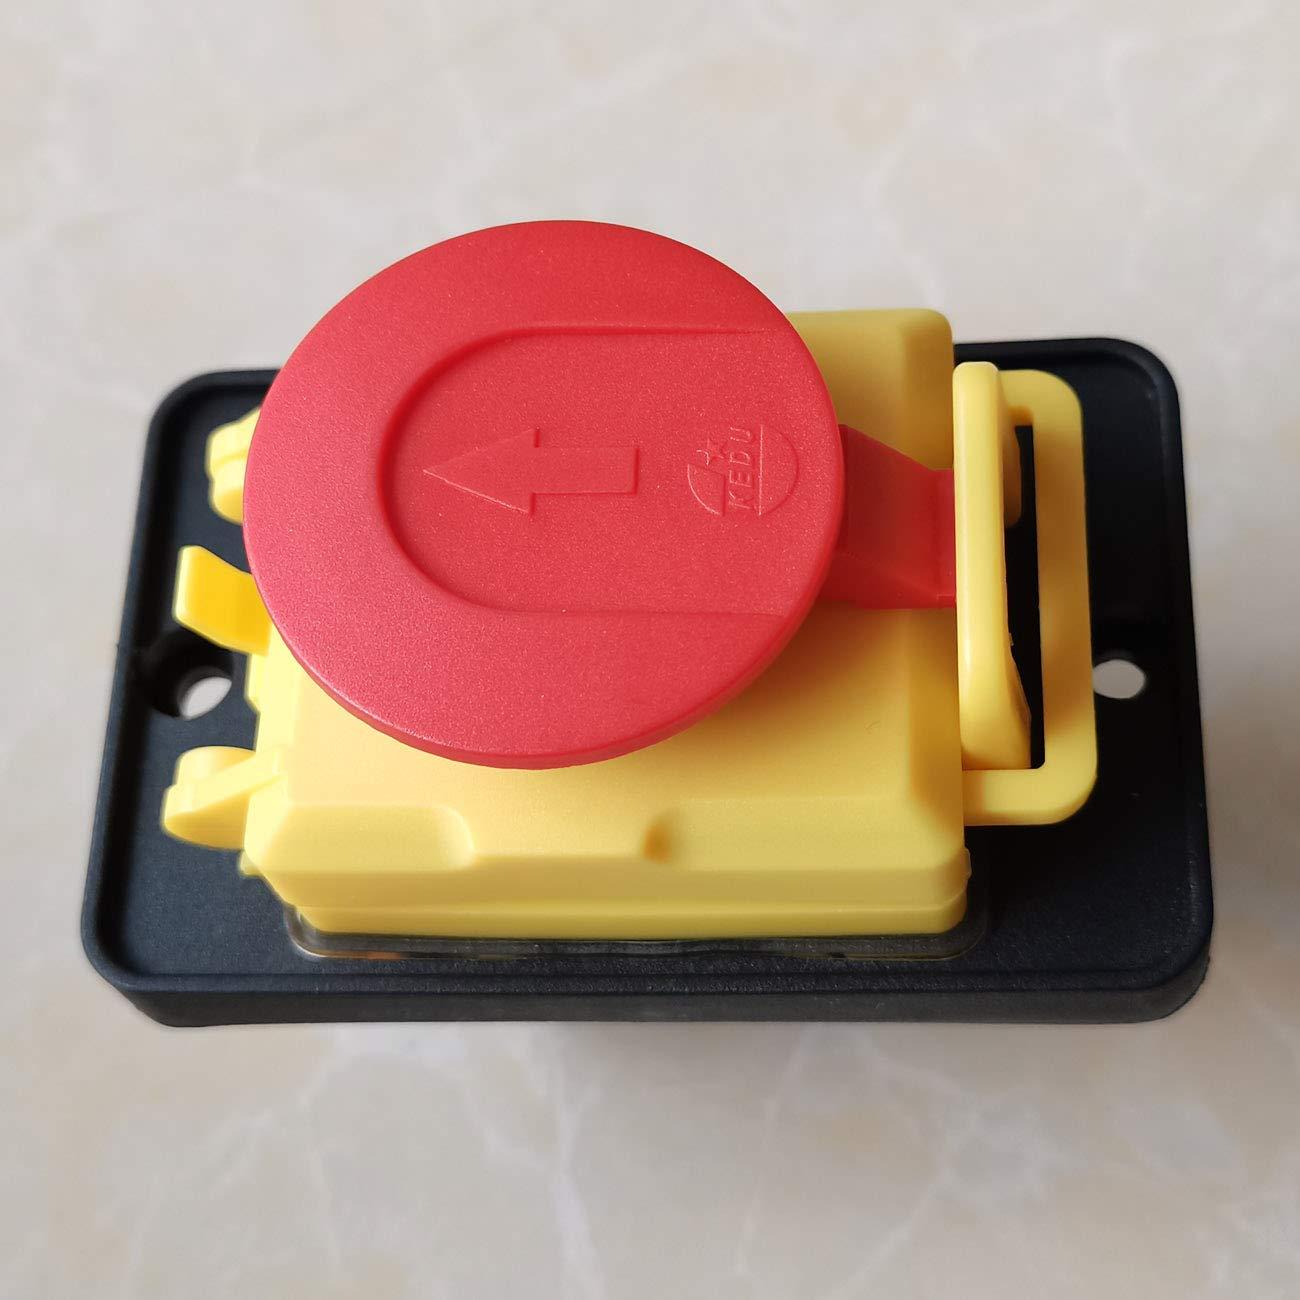 KEDU KJD18 7Pins Wasserdichter elektromagnetischer Schalter Not-Aus-Taster f/ür industrielle Werkzeugmaschinen AC 400V 15 A 5E4 IP54 8